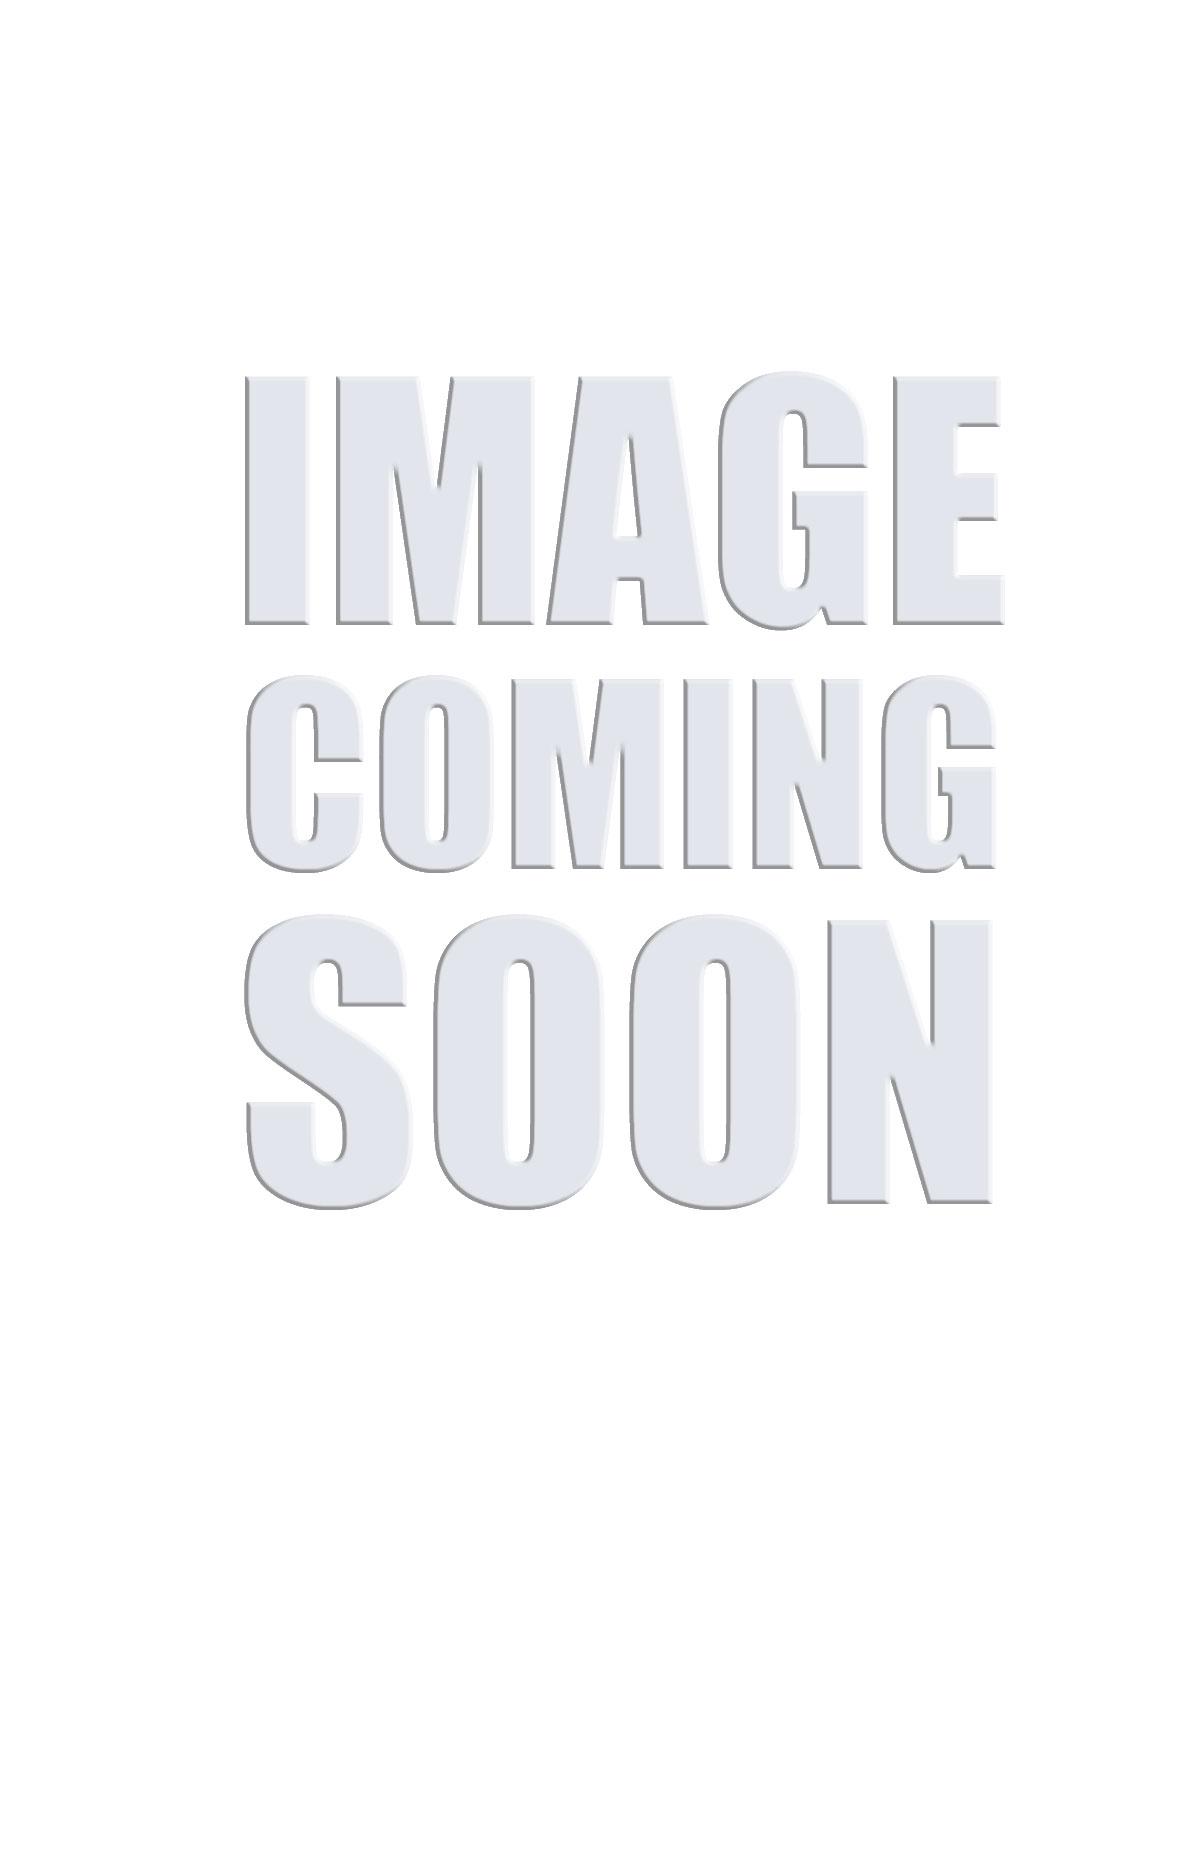 Tangential Discharge Vacuum Motor - Lamb #116207-00, BPT, B/B, PB, 2 STG